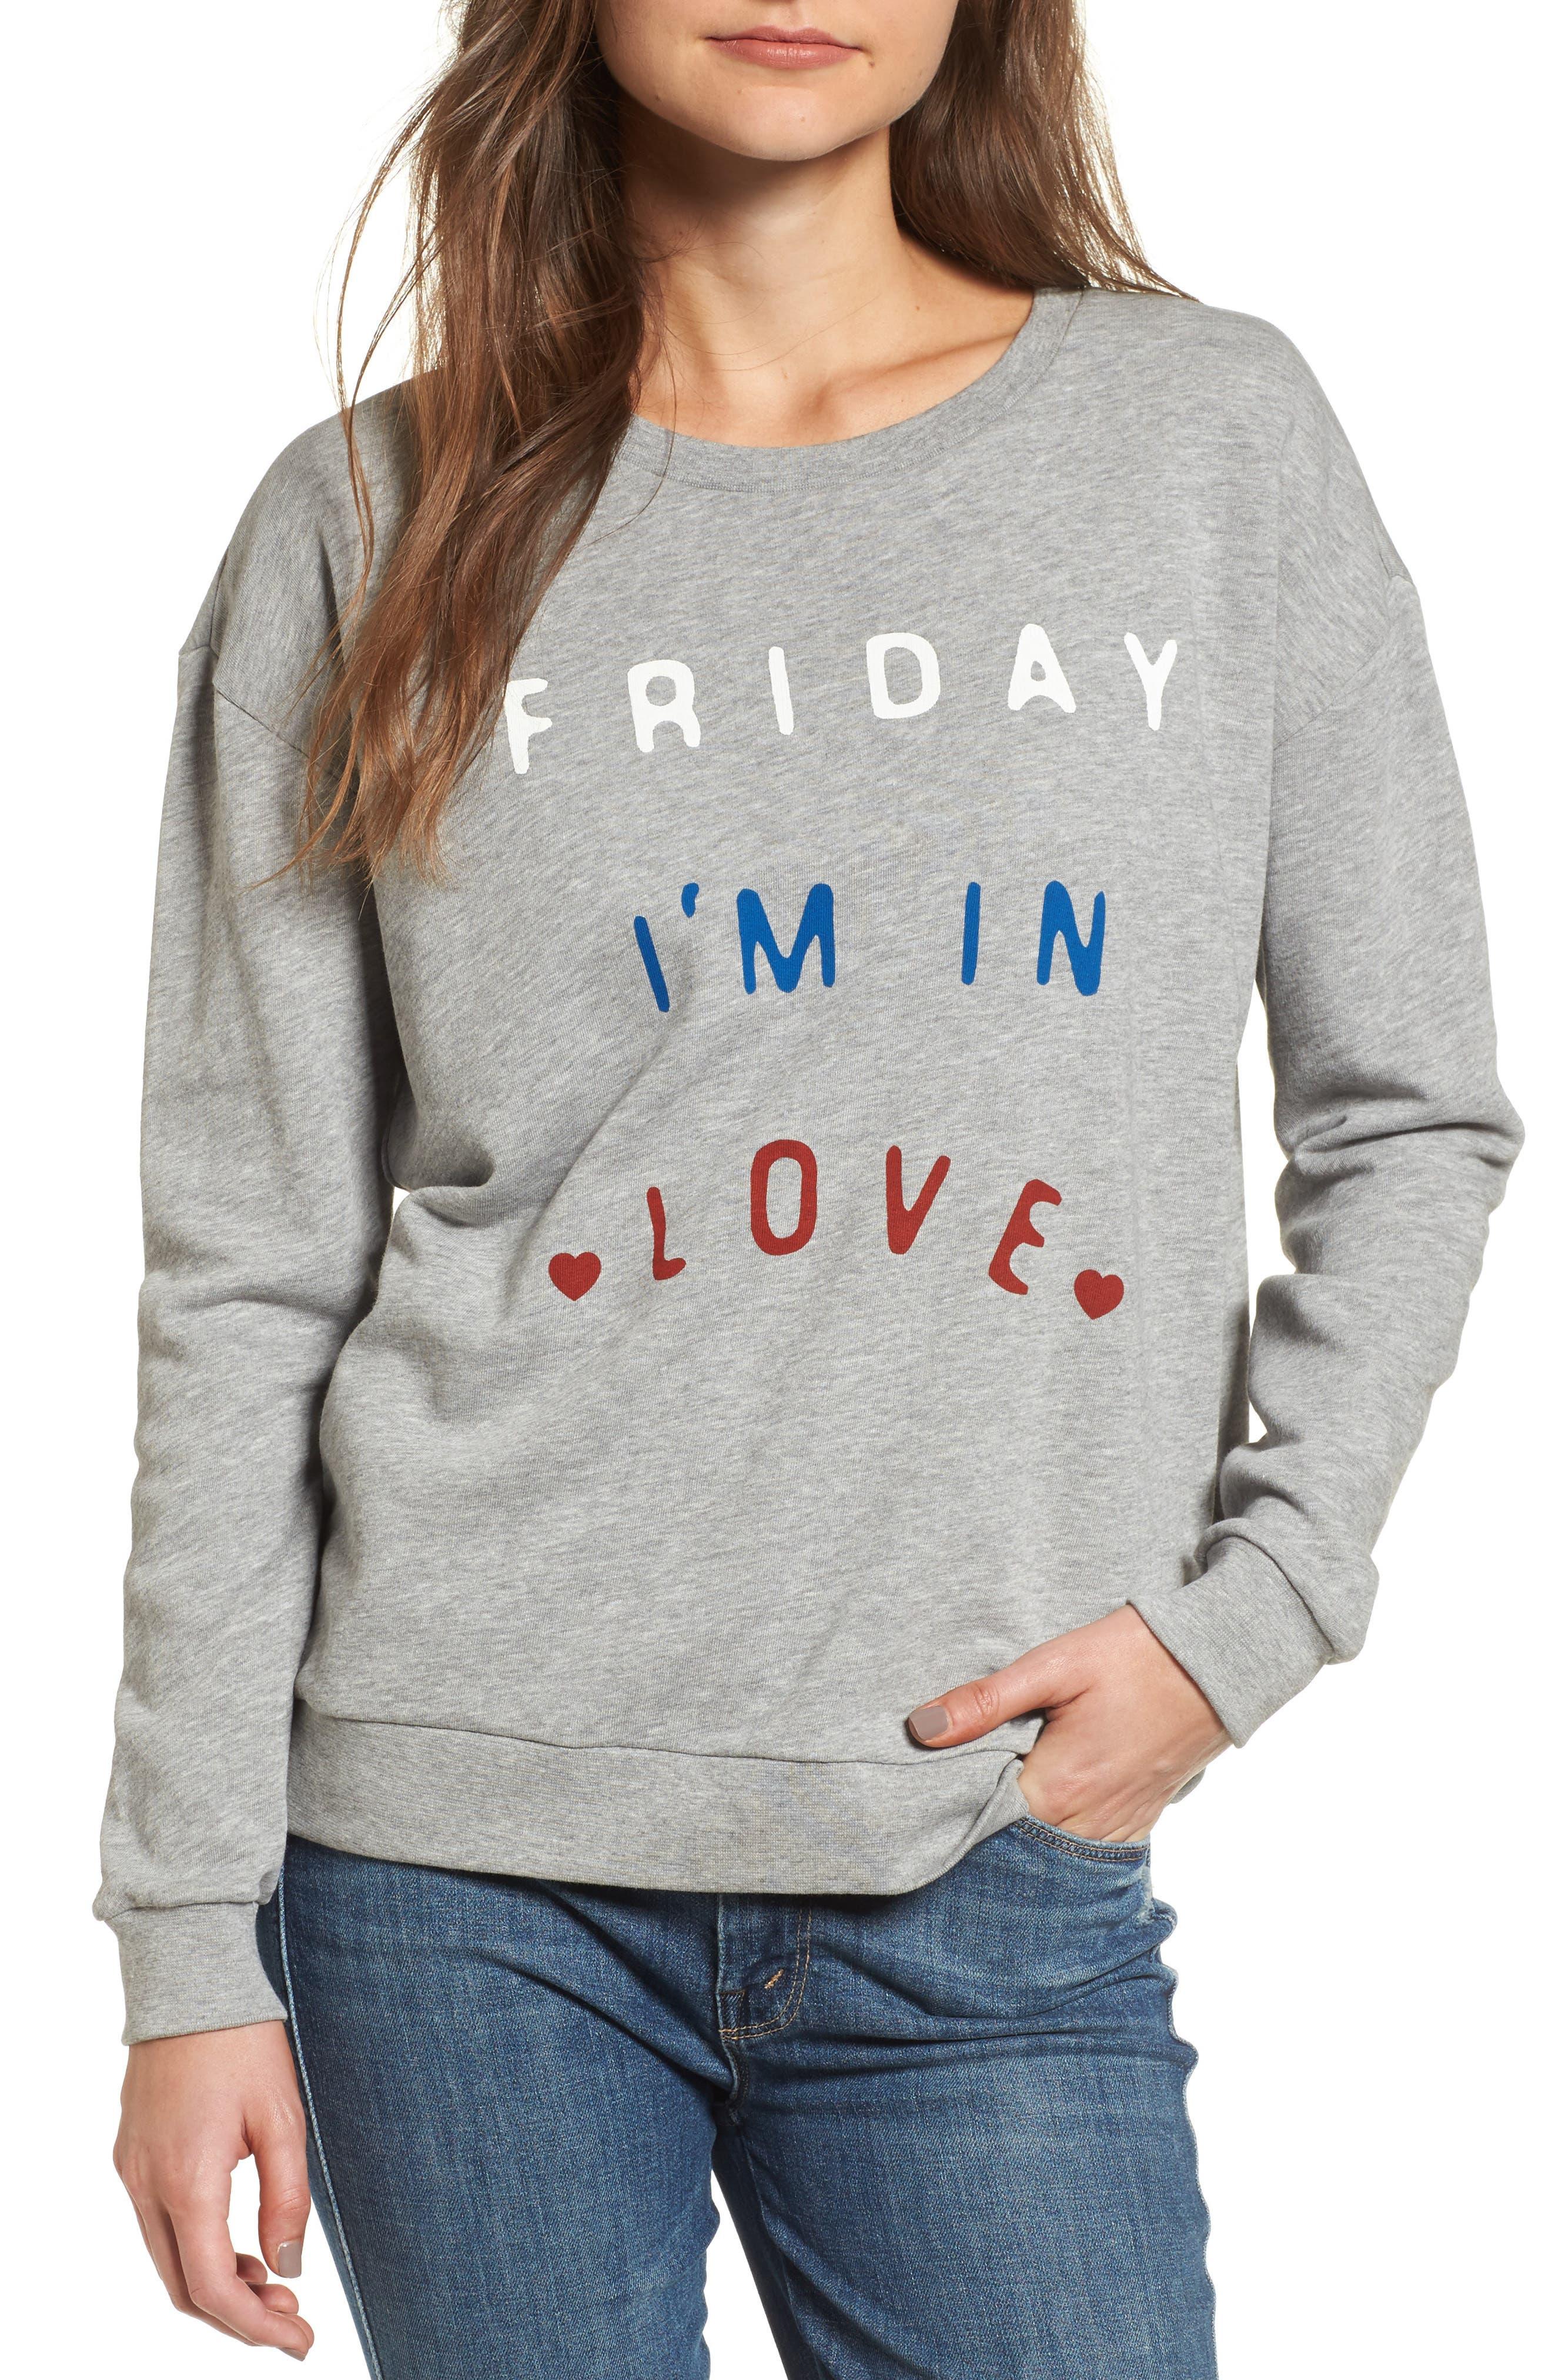 Friday I'm In Love Sweatshirt,                         Main,                         color, Heather Grey